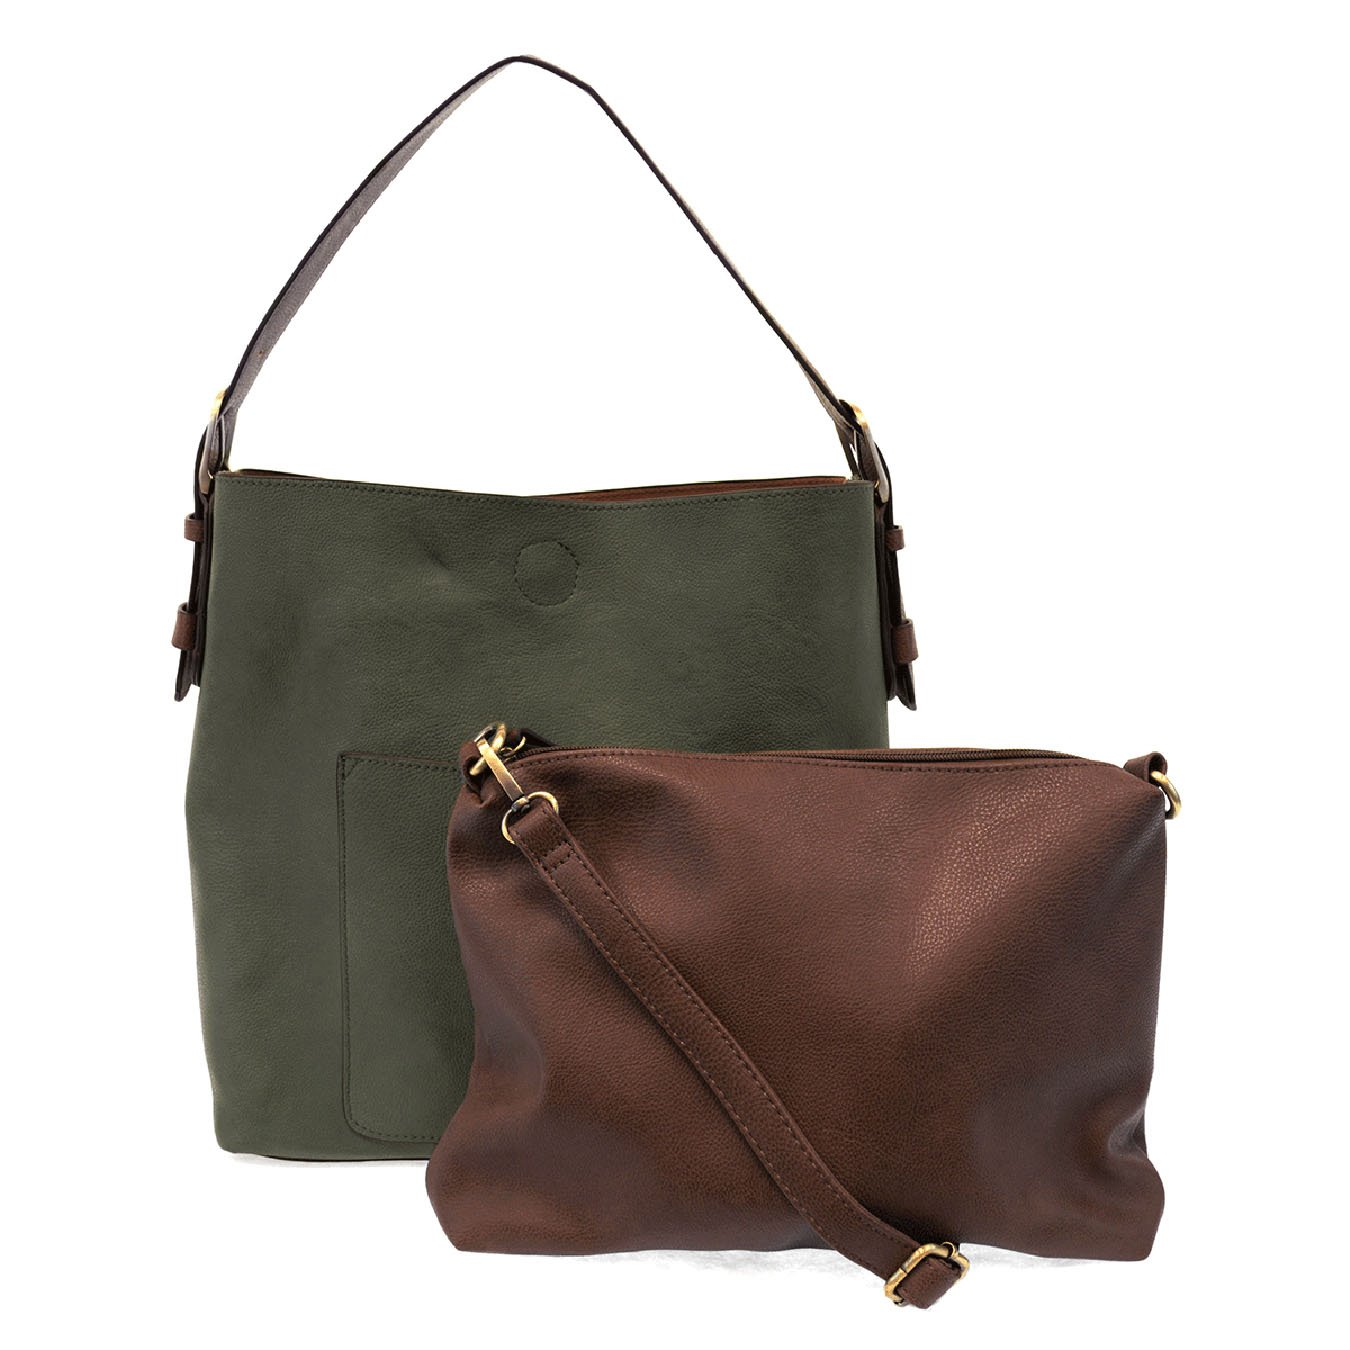 Dark Olive Hobo Handbag With Coffee Handle By Joy Susan Vegan Leather